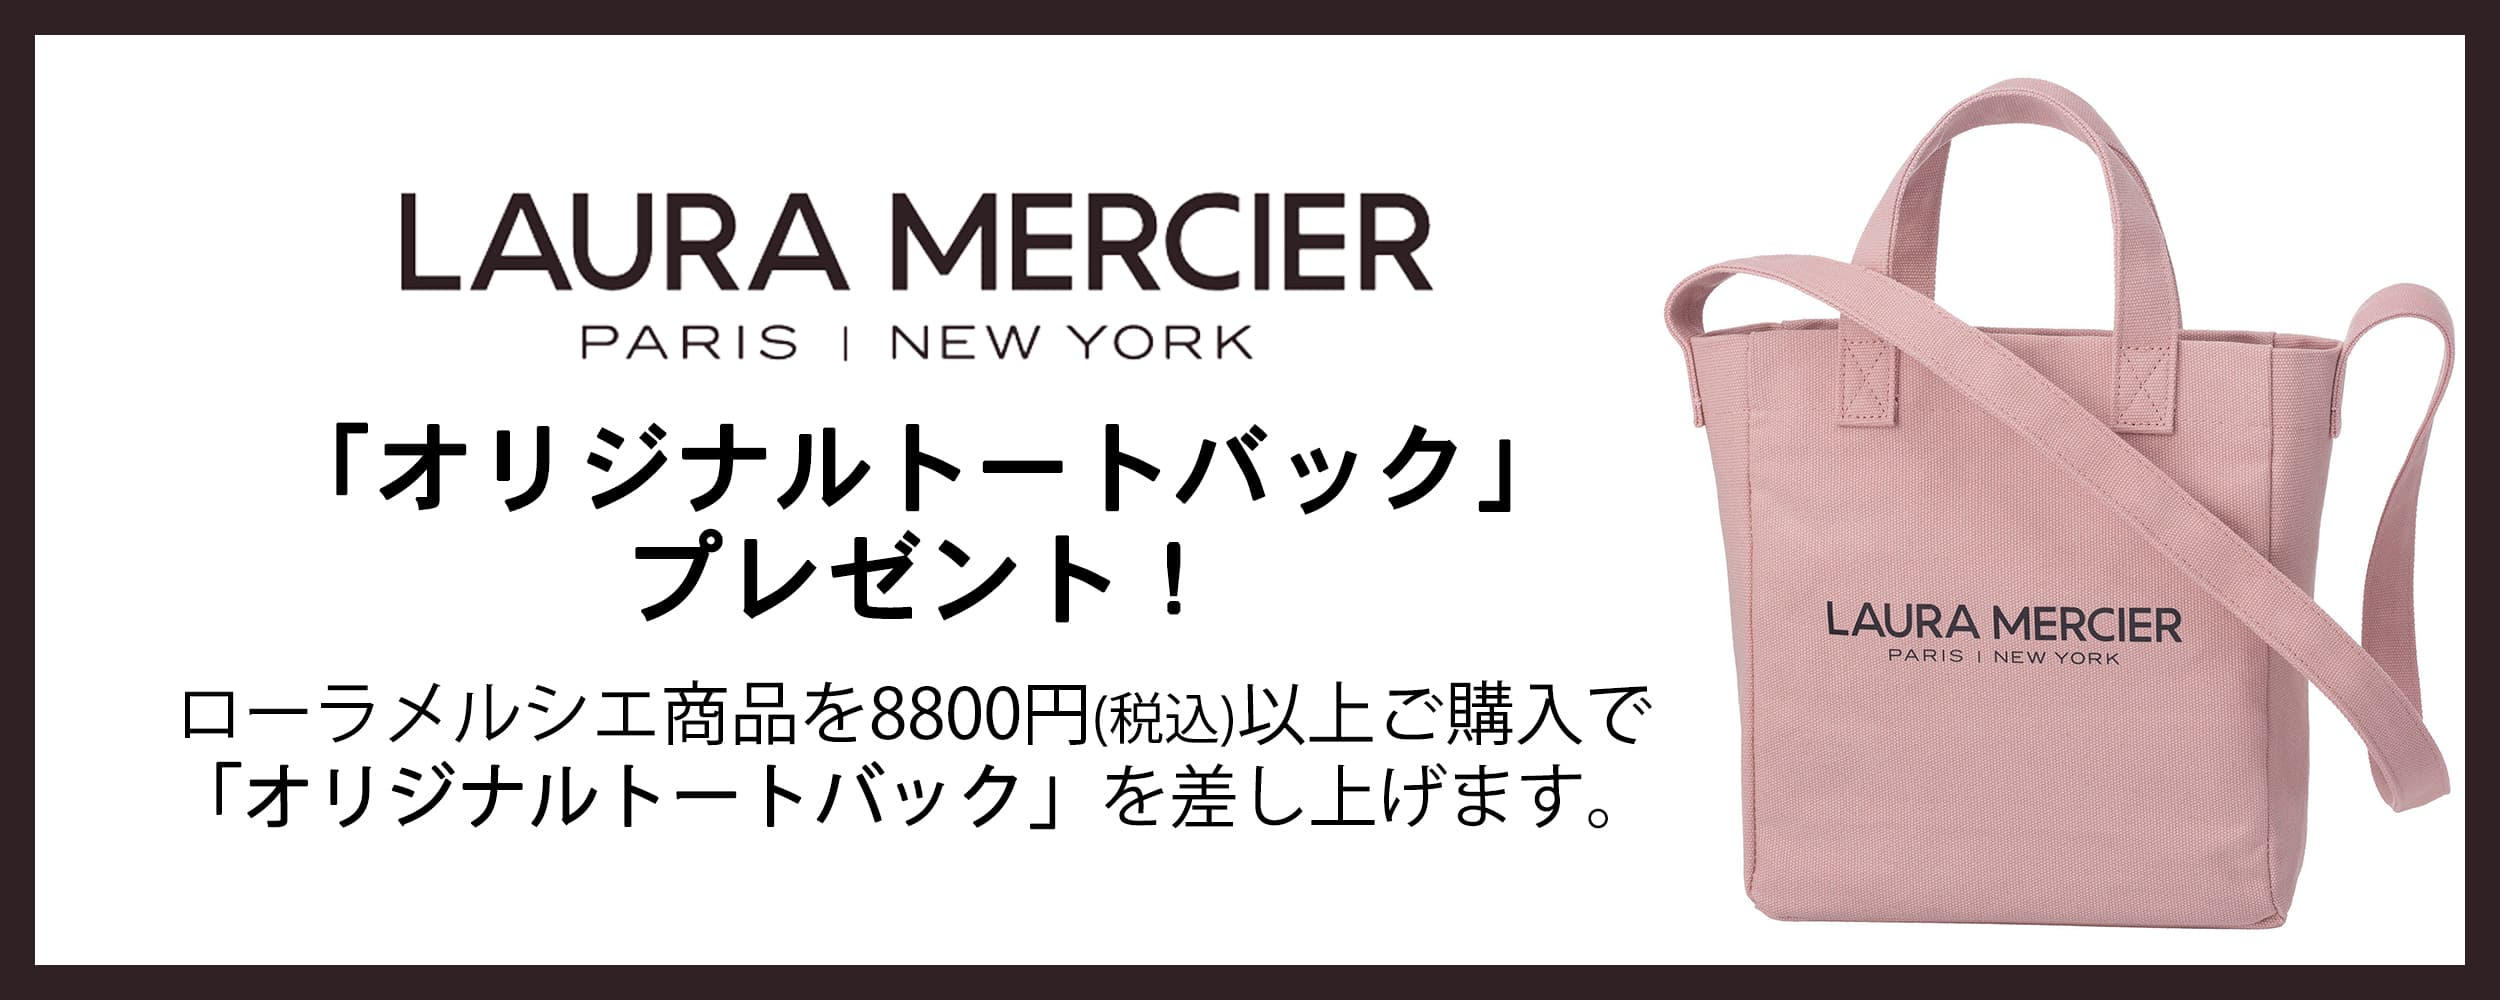 LAURA MERCIER - キャンペーン